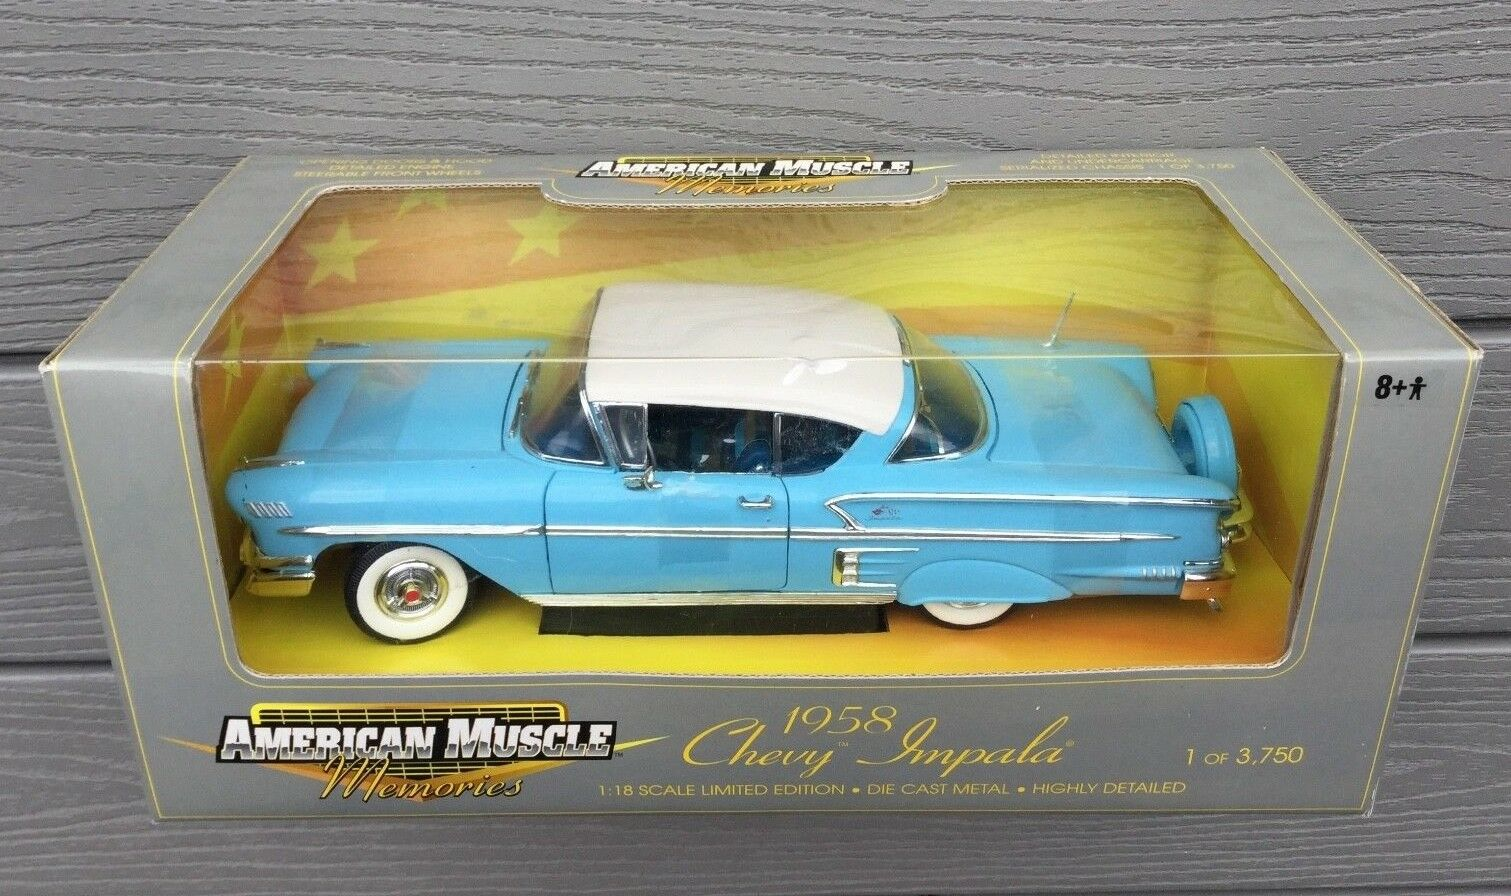 ERTL 1 18 AMERICAN MUSCLE 1958 blueE CHEVY CHEVY CHEVY IMPALA LTD EDIT 1  3750 ITEM 32286 F S 44059e